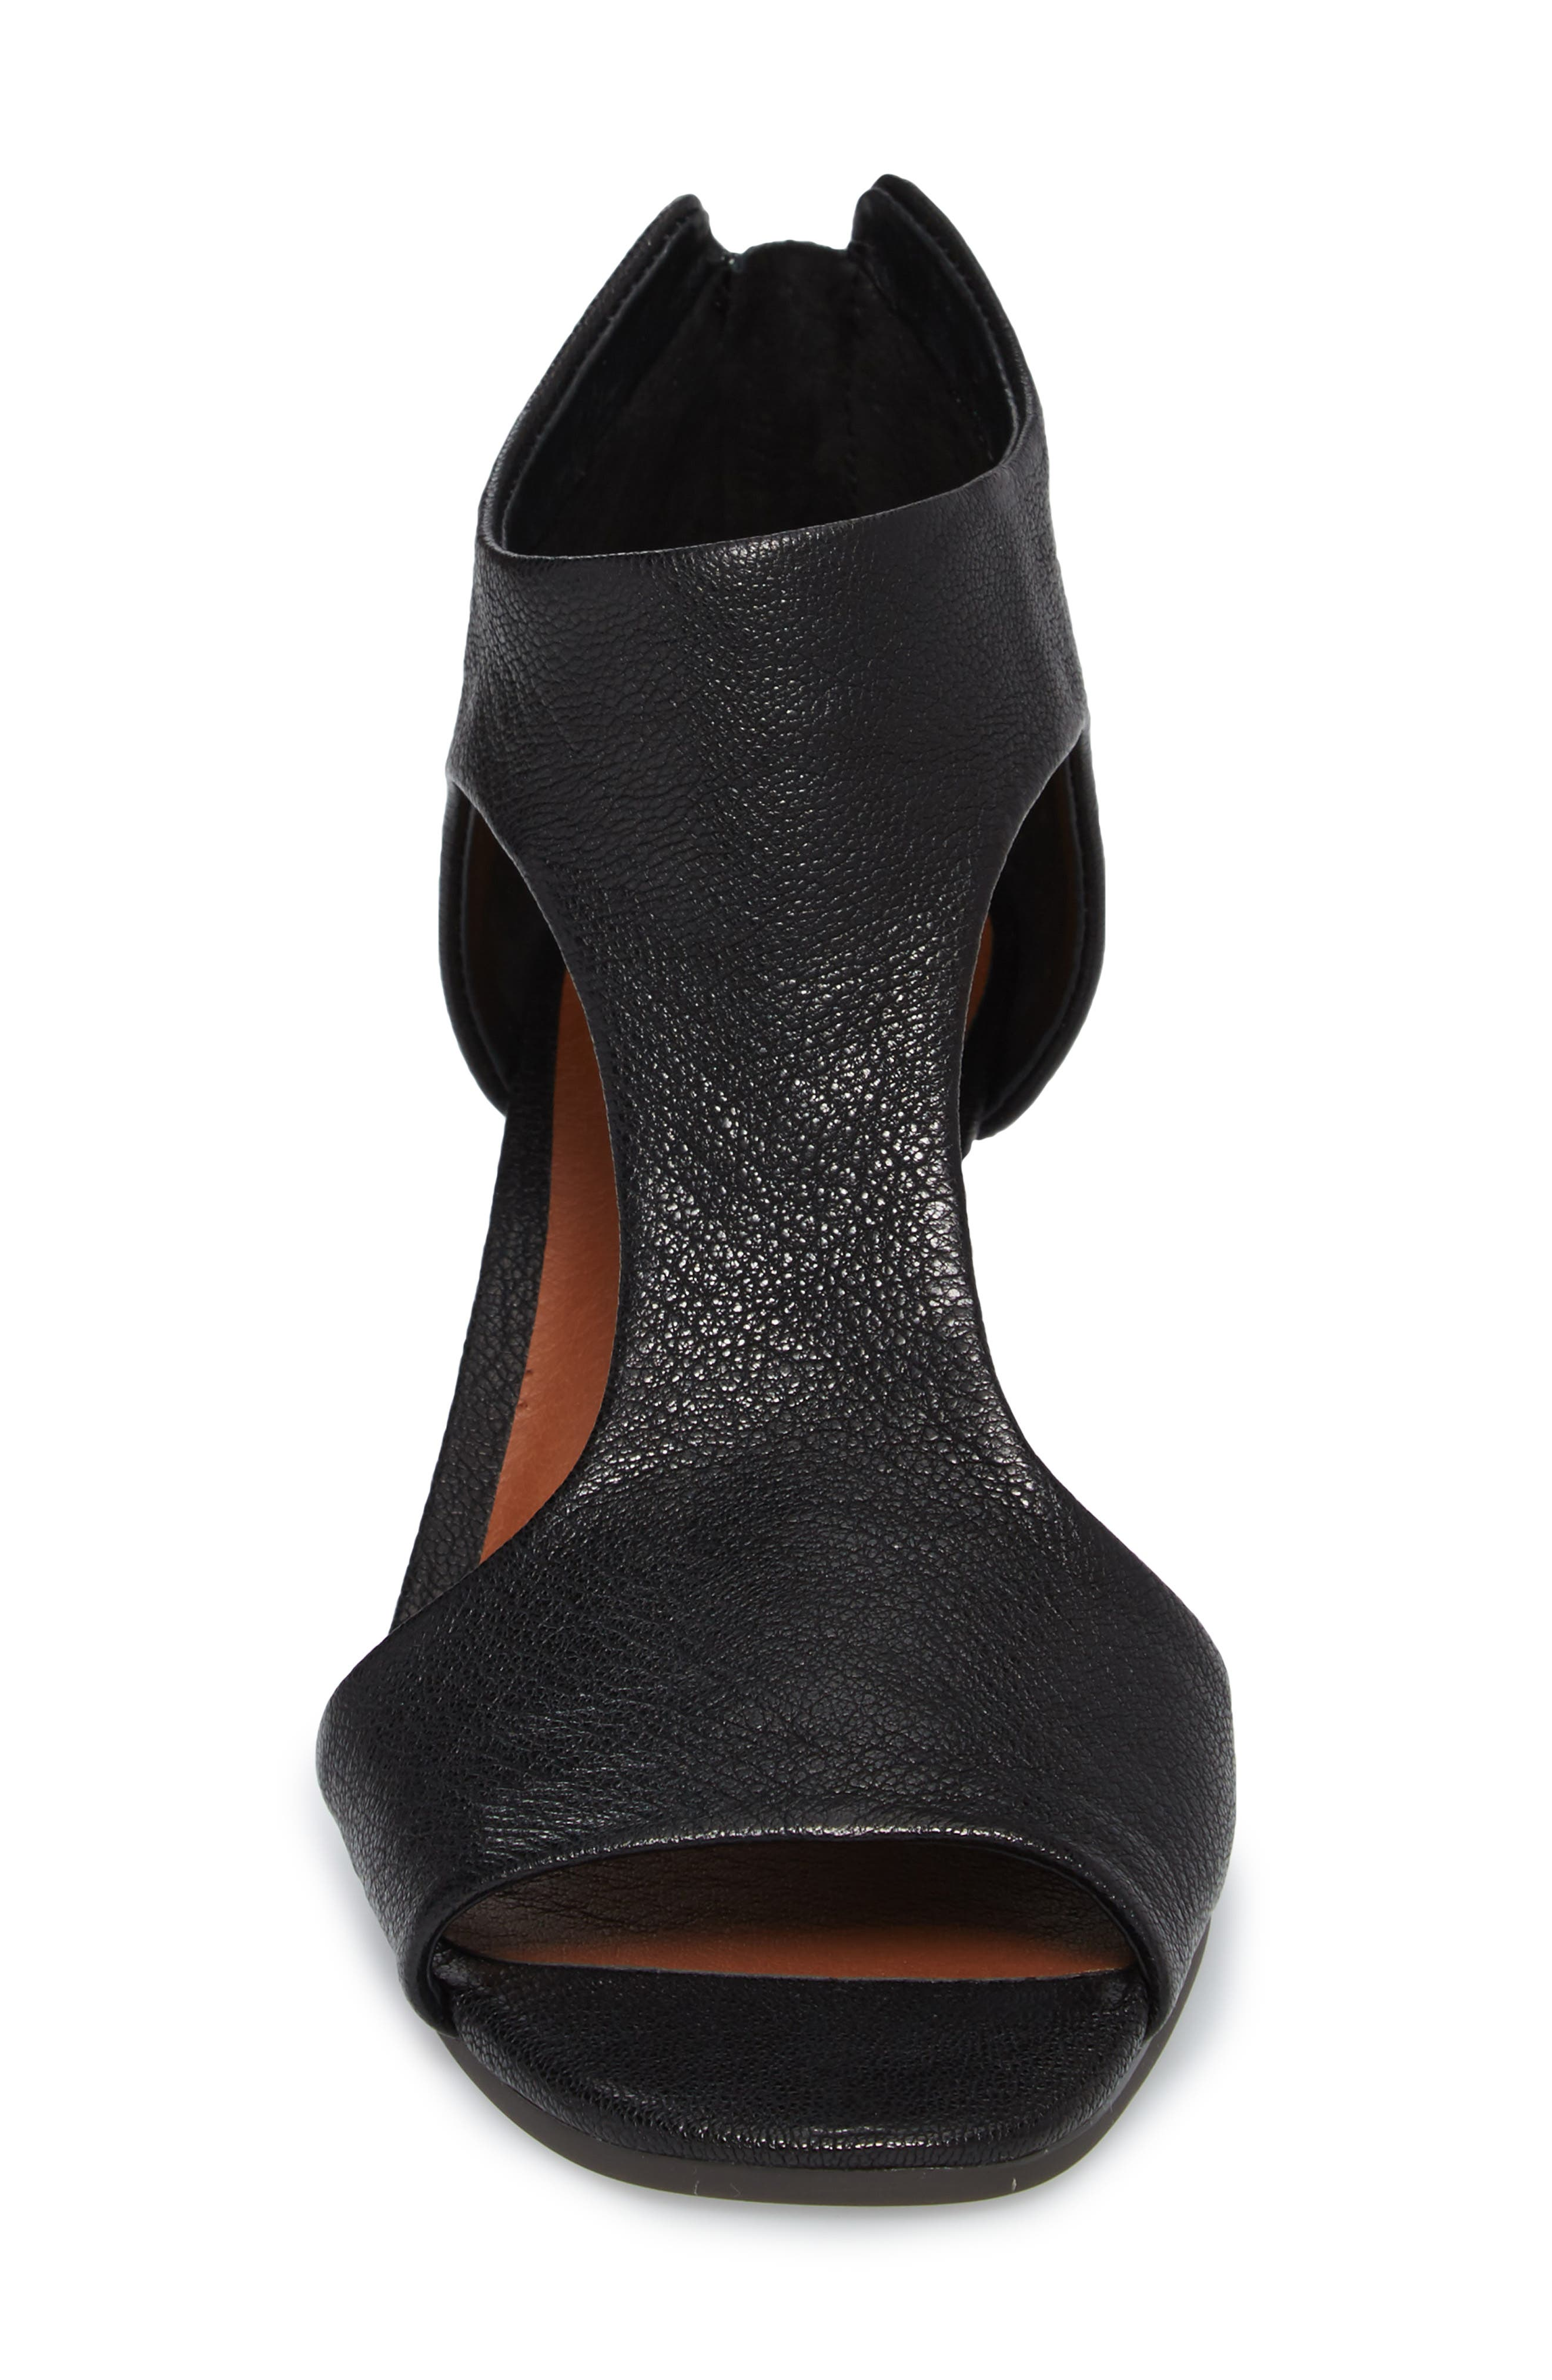 Tehirr Wedge Sandal,                             Alternate thumbnail 4, color,                             001